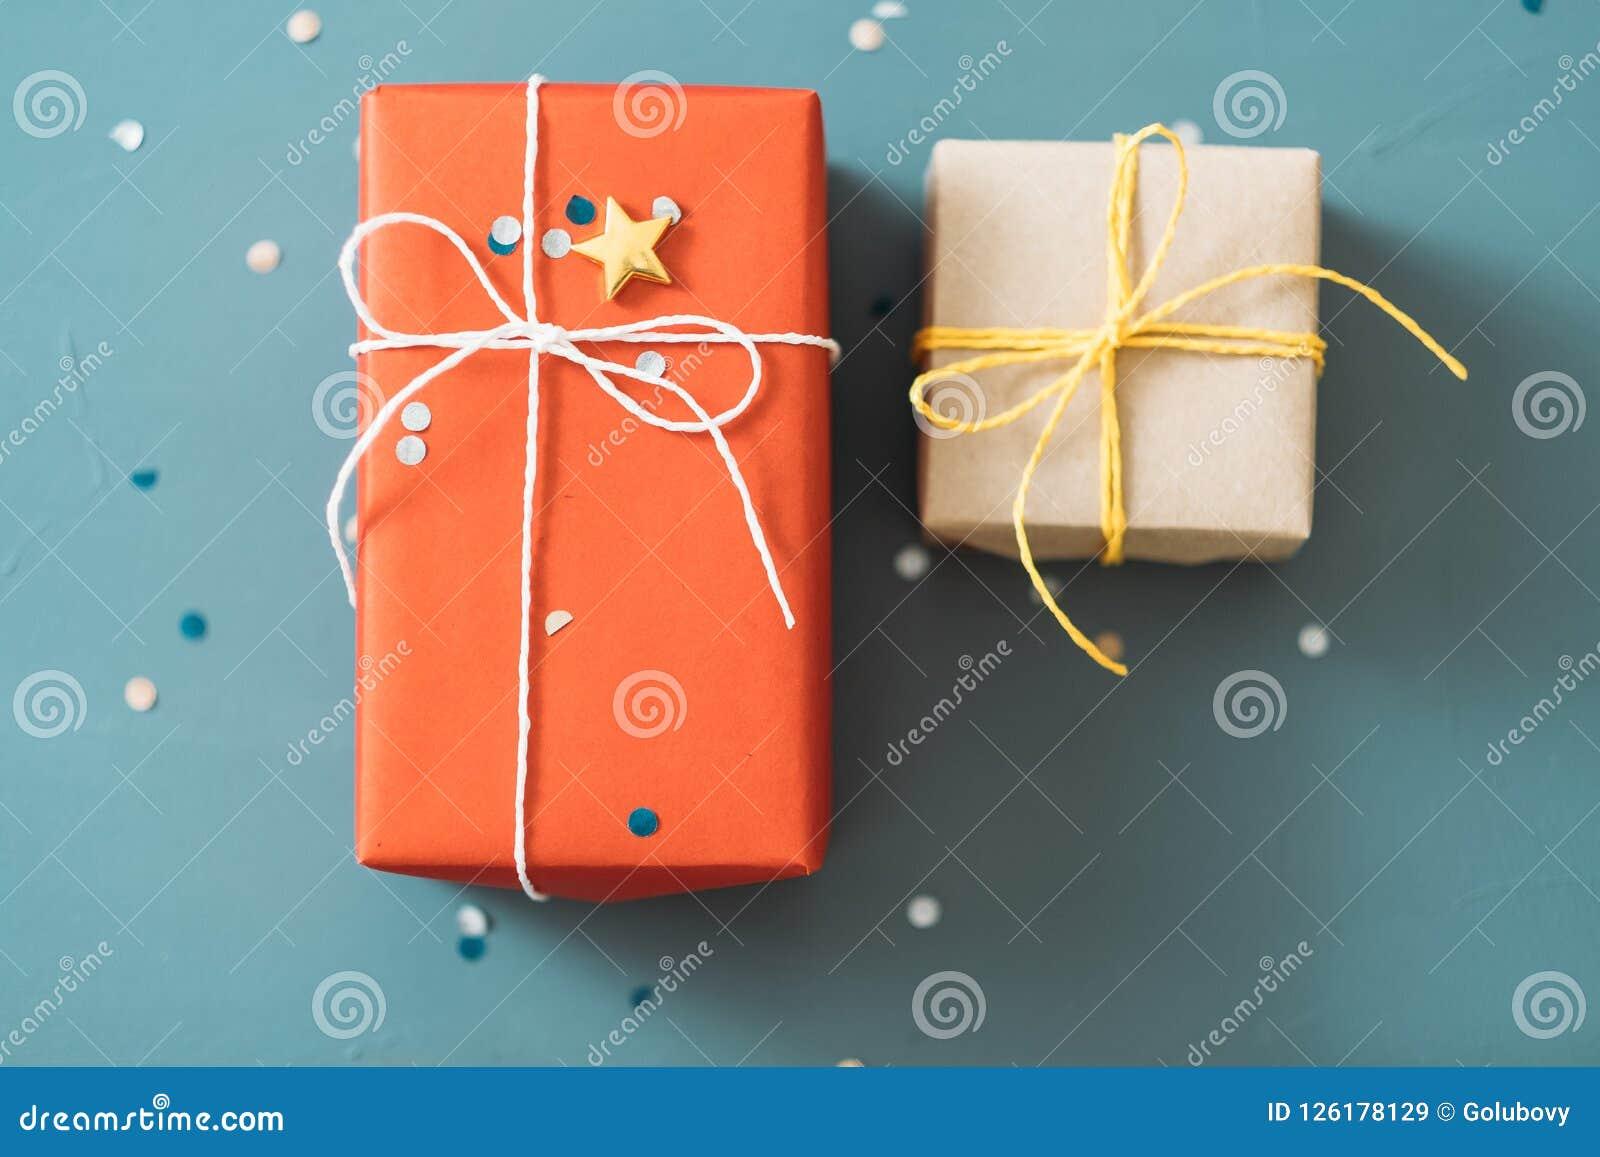 Couple Gift Anniversary Valentine Two Present Box Stock Image